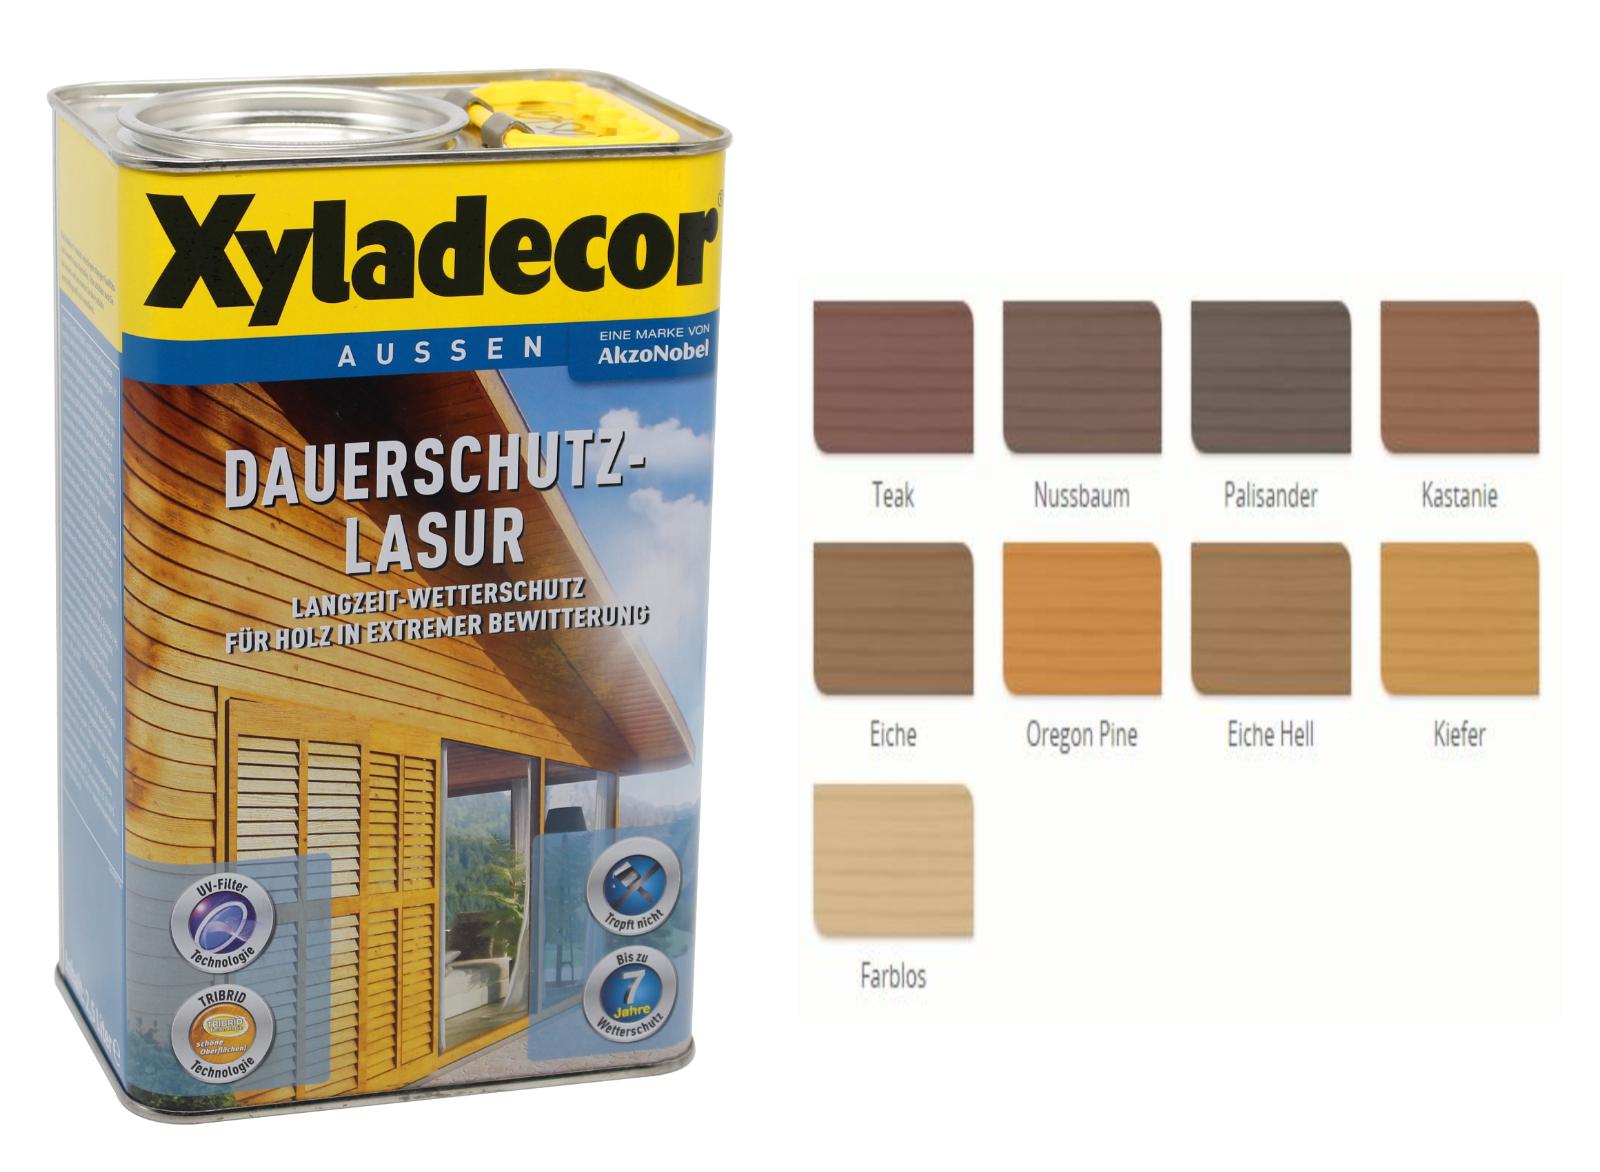 Xyladecor Farben.Details Zu Xyladecor Dauerschutzlasur Holzlasur Farbwahl 4l Beule Holzschutz Lasur